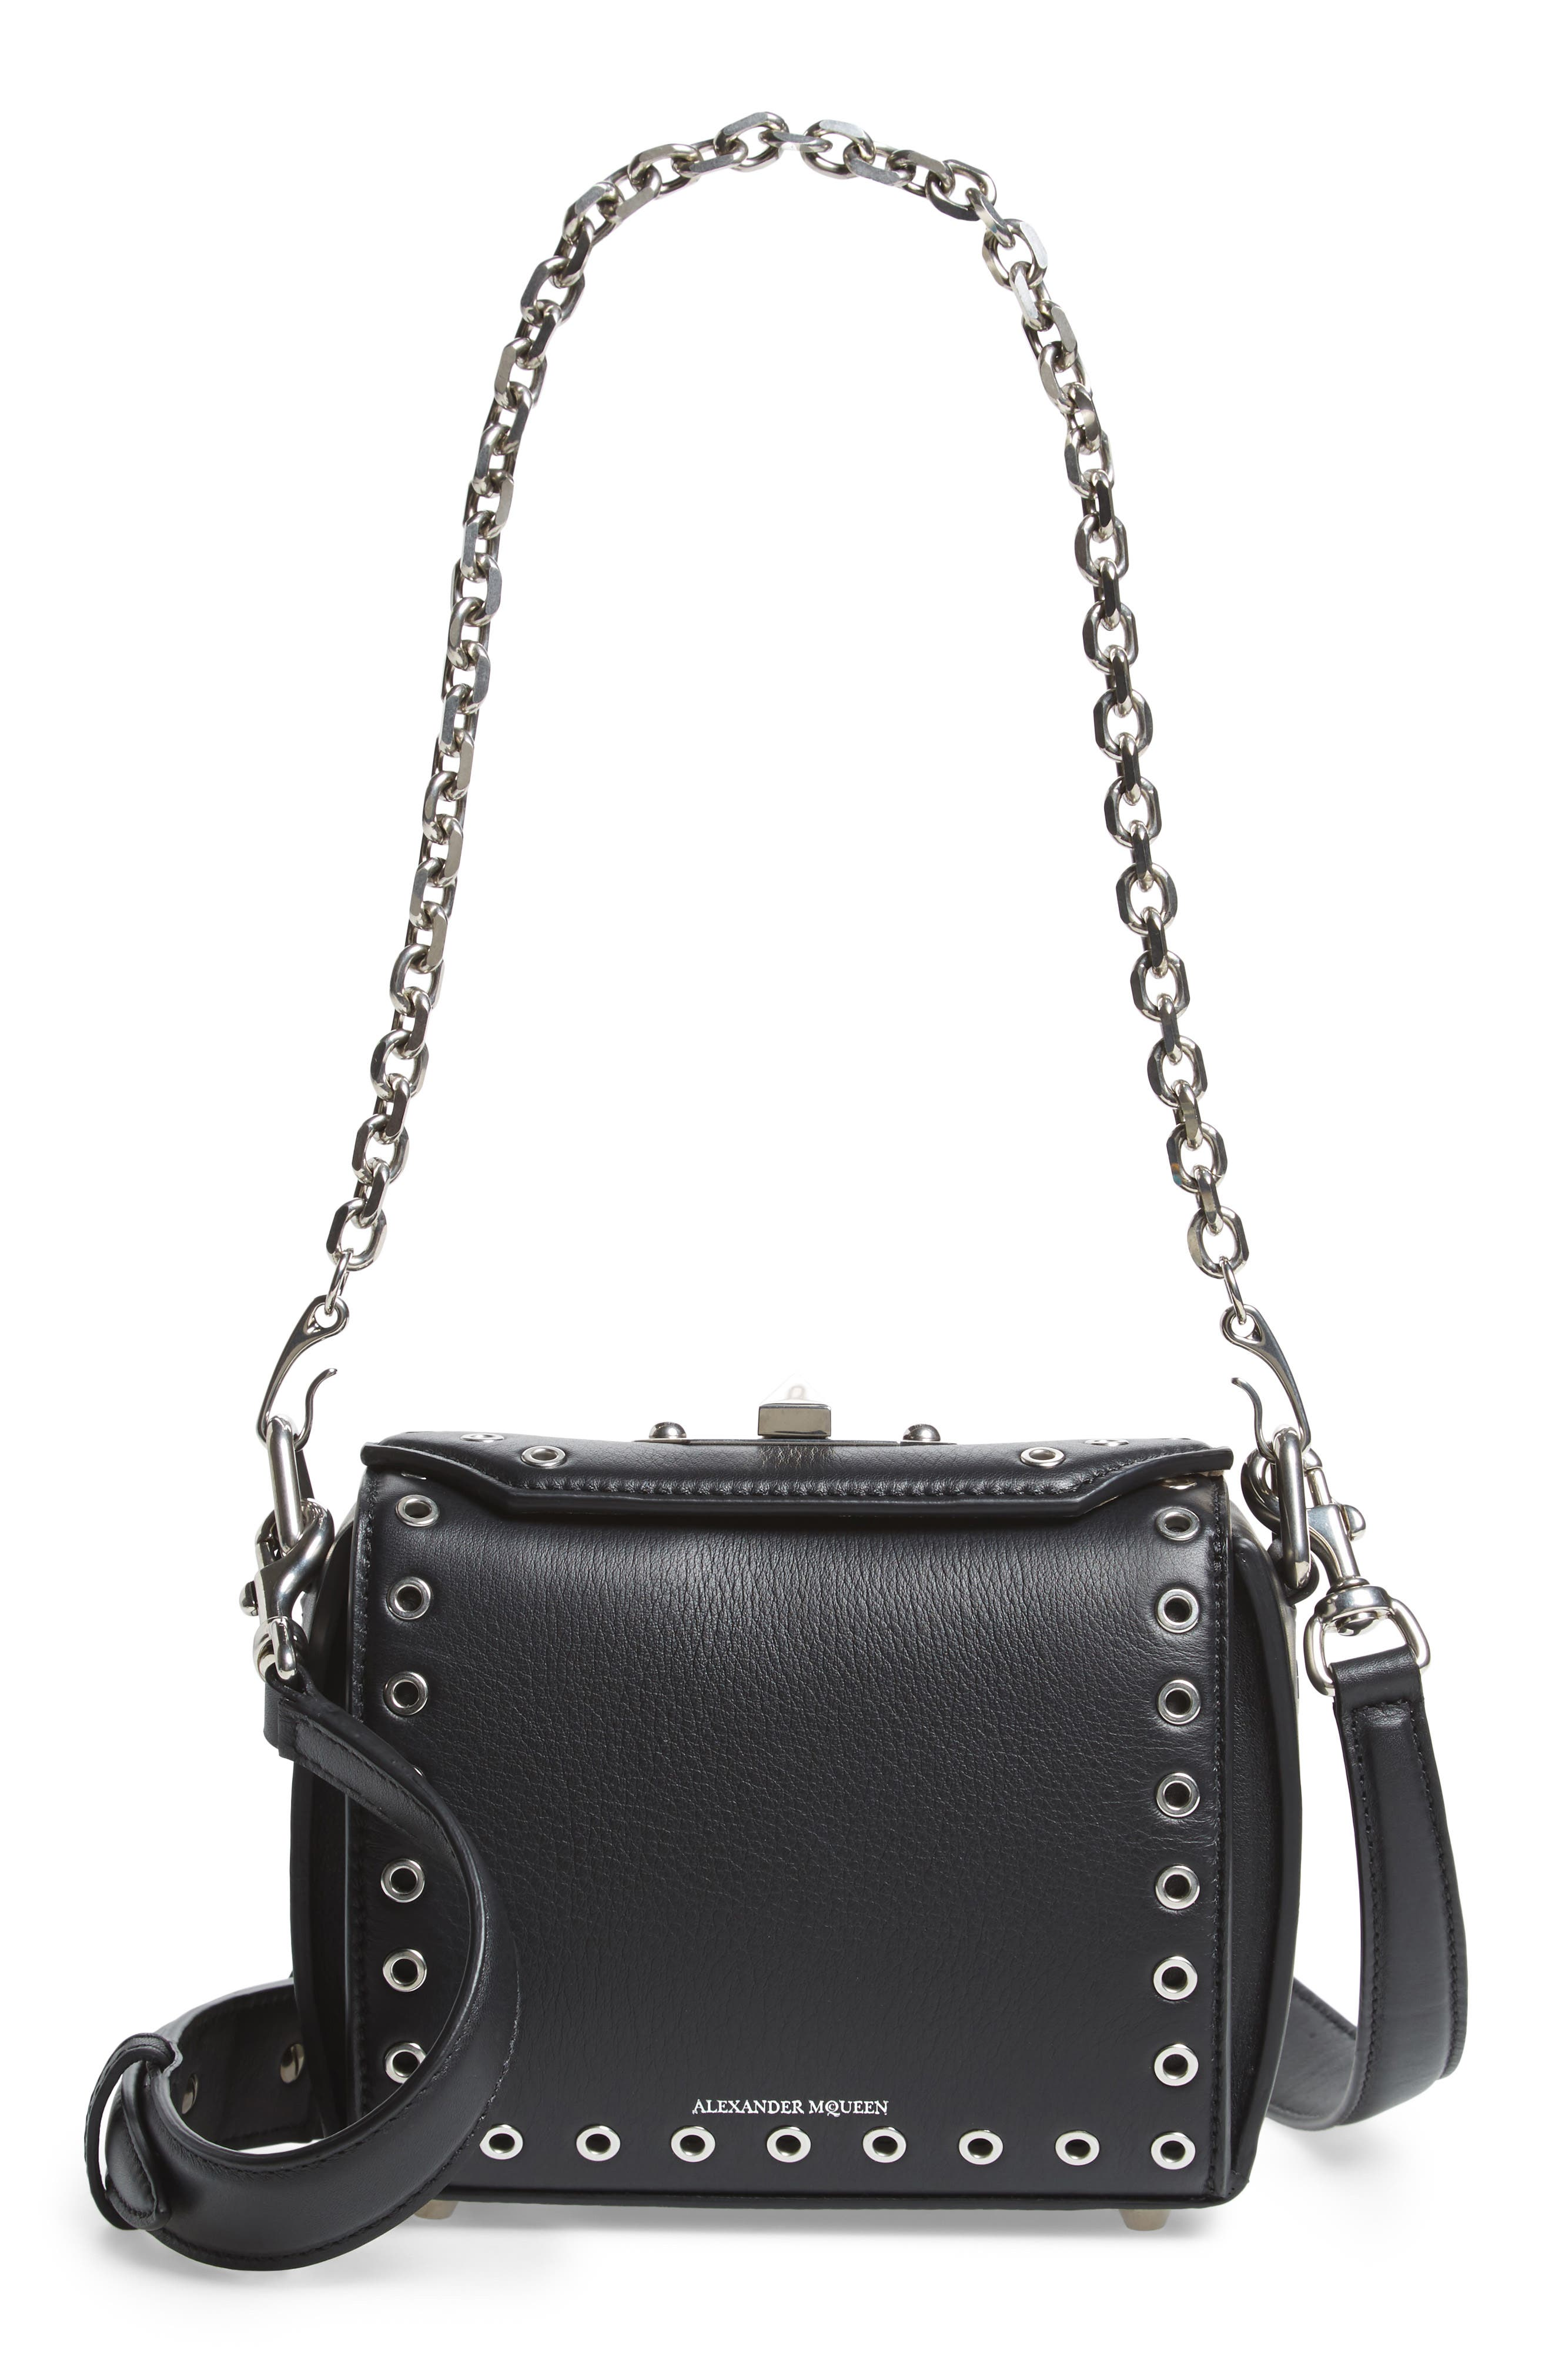 Alexander McQueen Mini Box Grommet Leather Bag